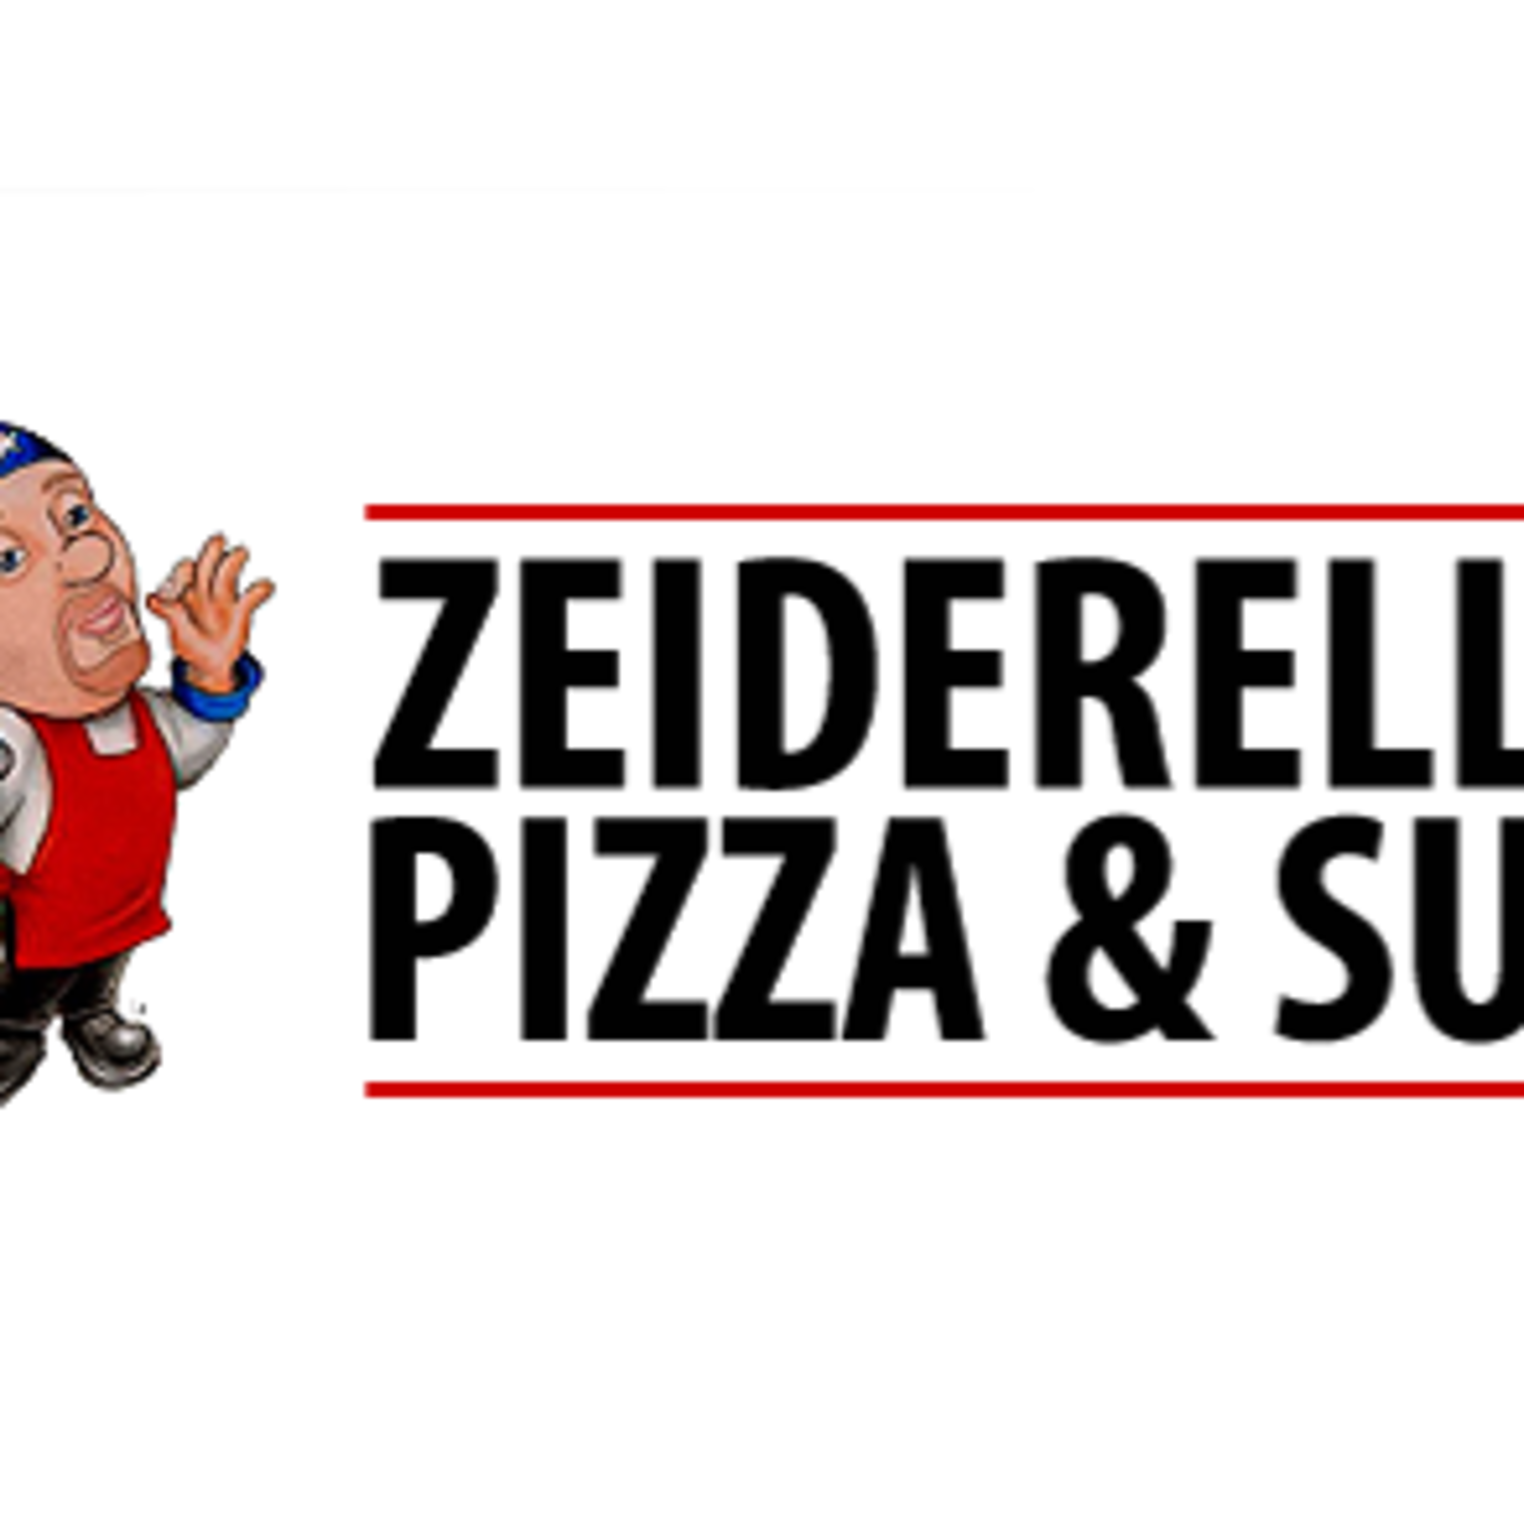 Zeiderelli's Pizza & Subs - Lemoyne